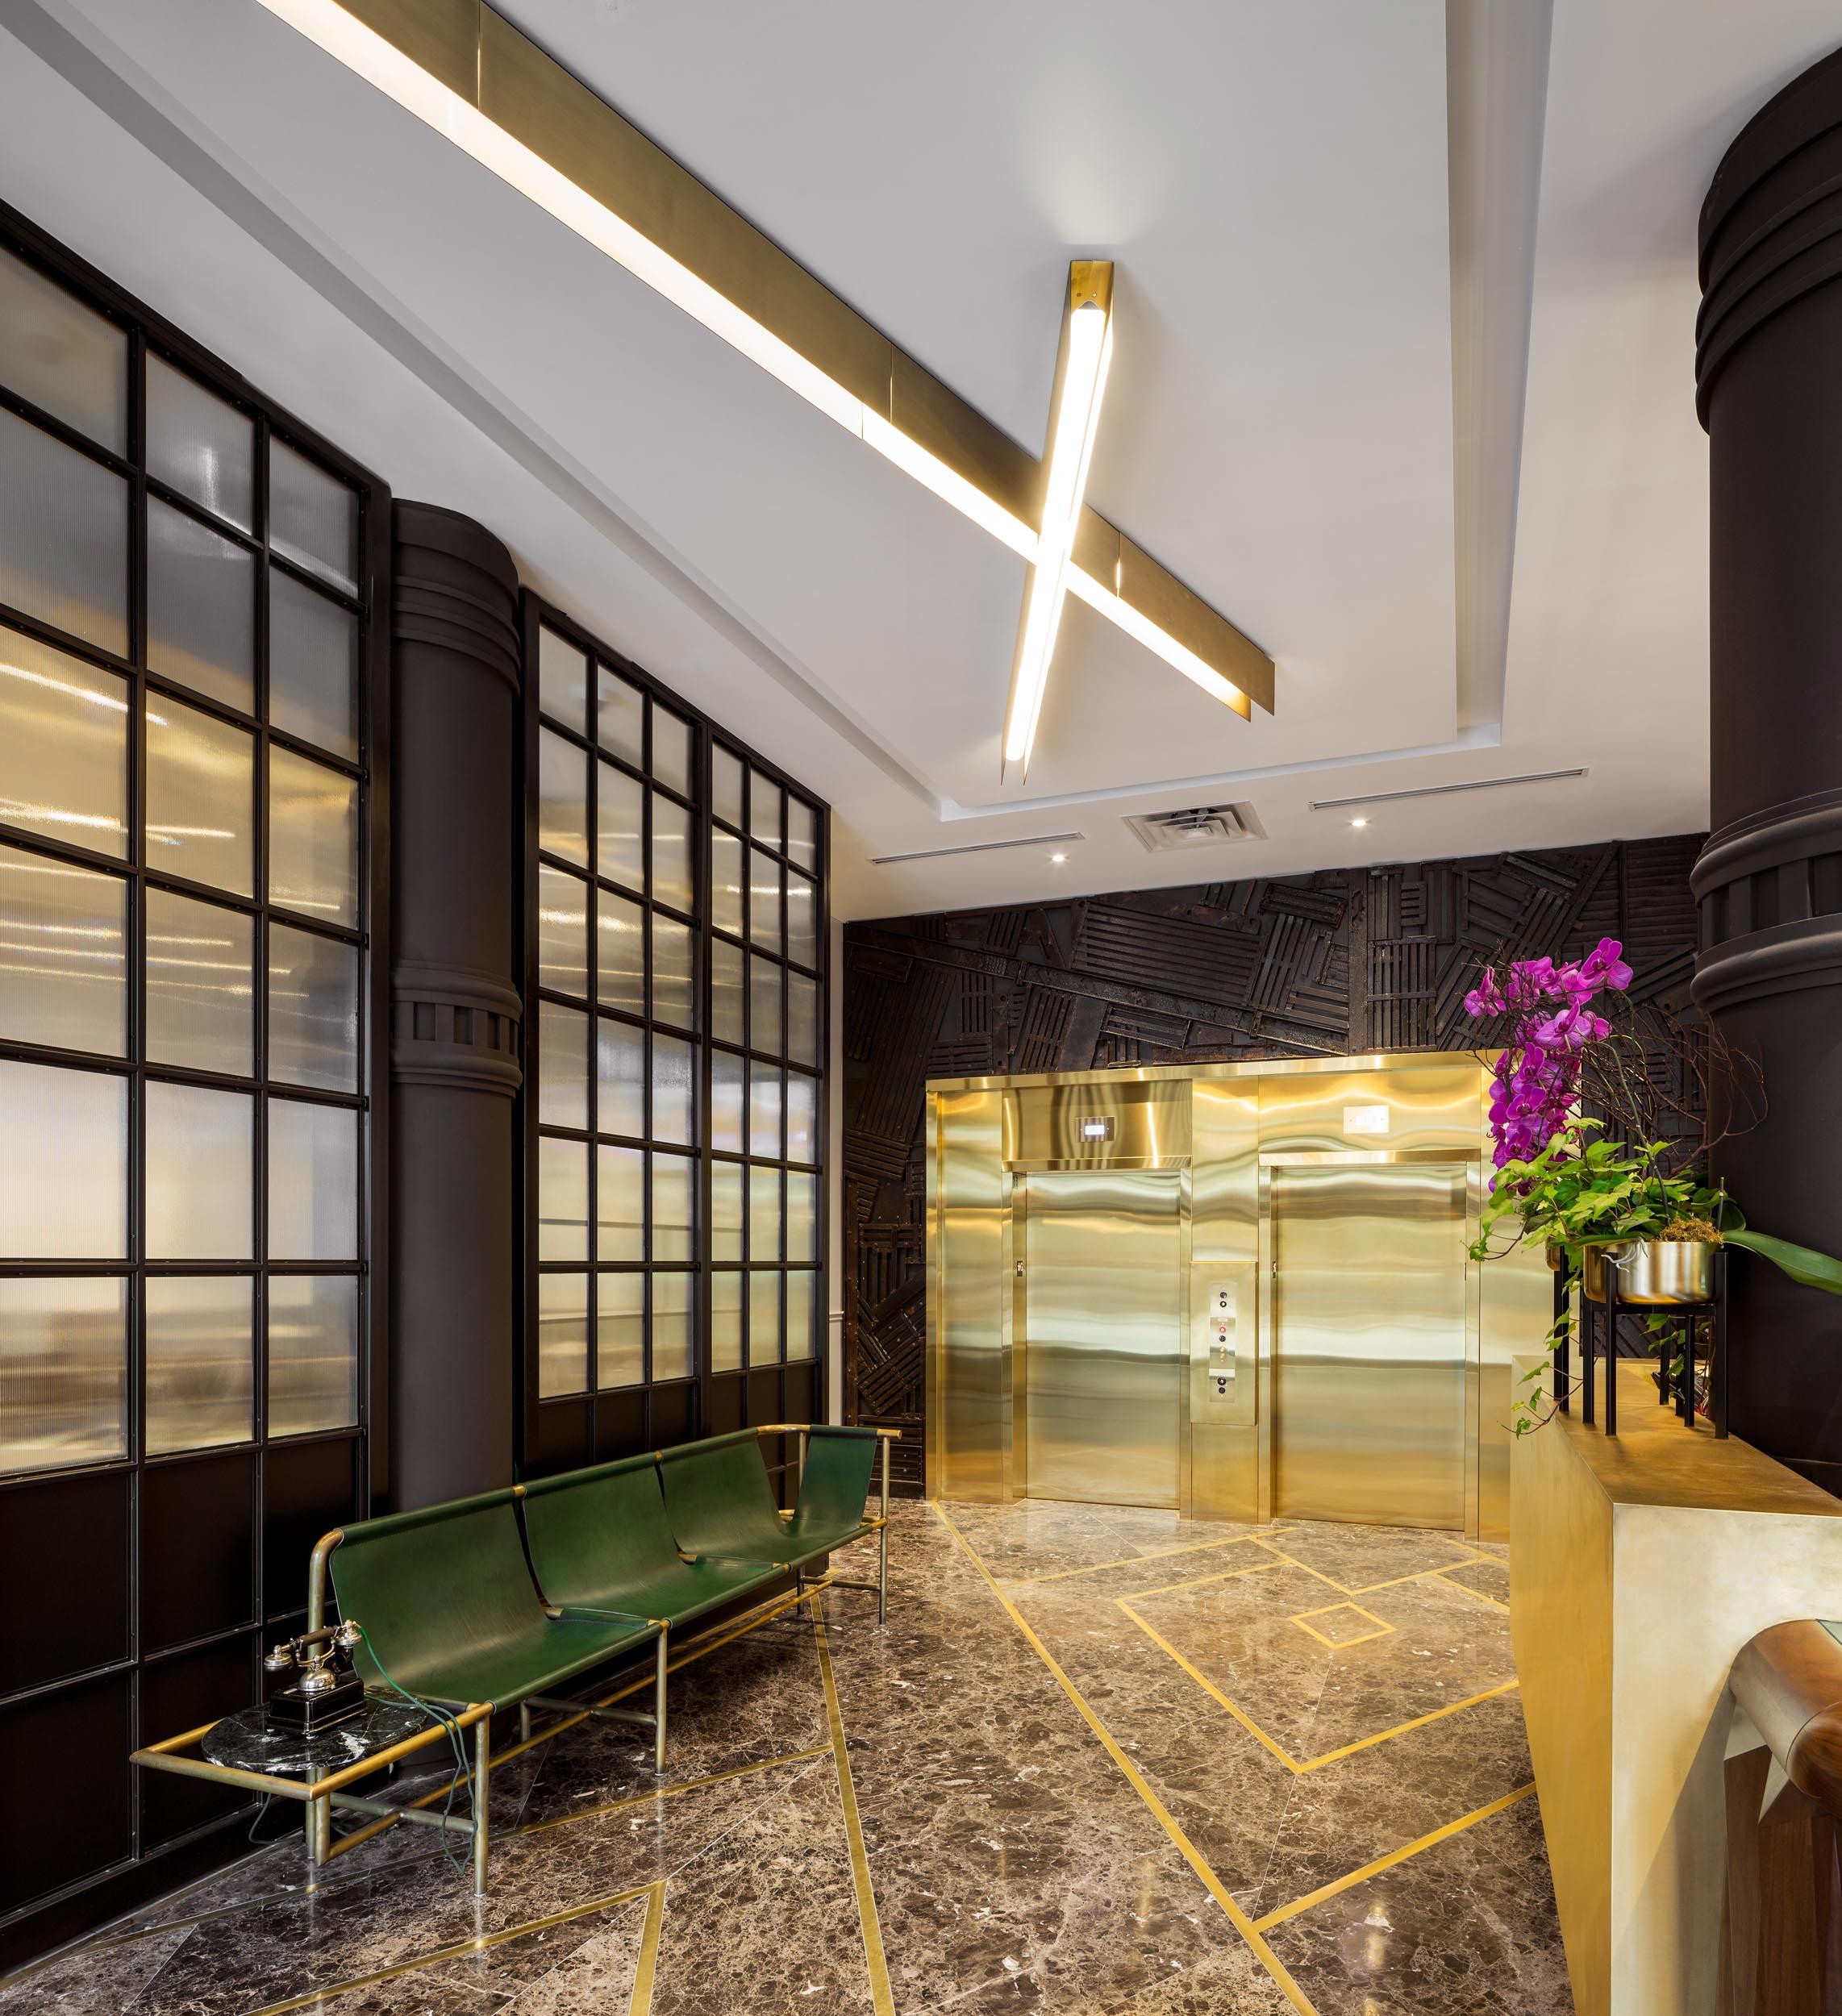 Broadview Hotel Lobby Interior Design Photography in Toronto